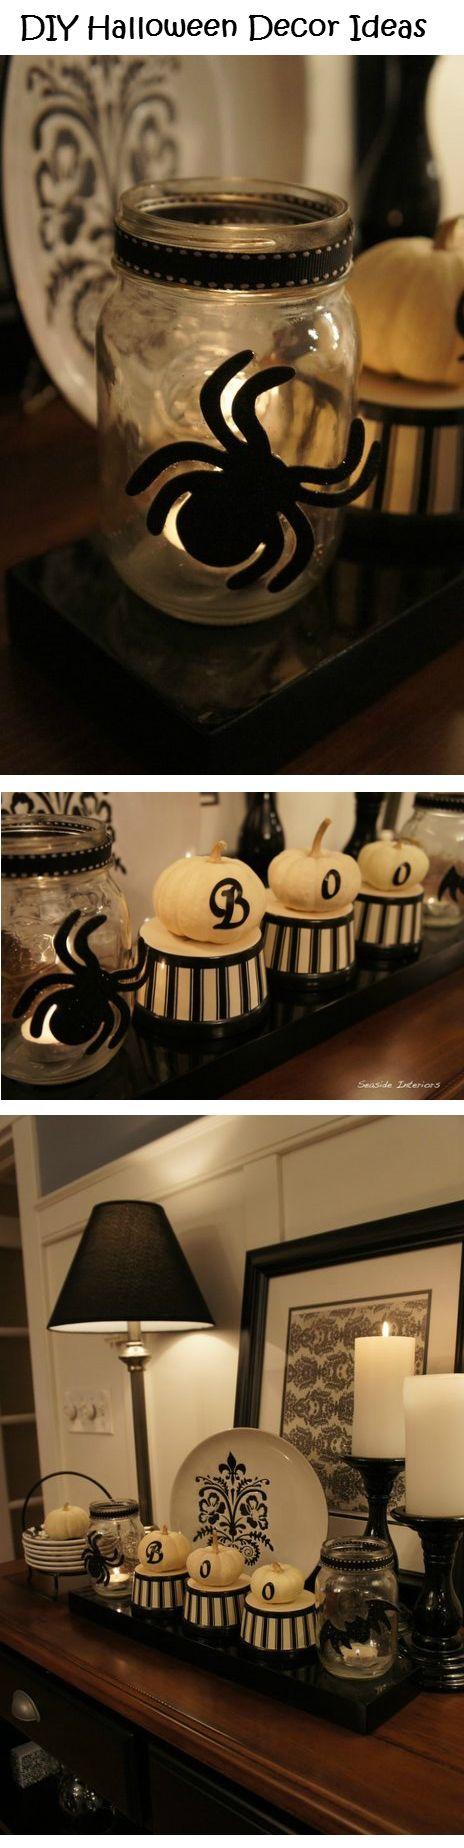 Best 25+ Classy halloween decorations ideas on Pinterest | Classy ...